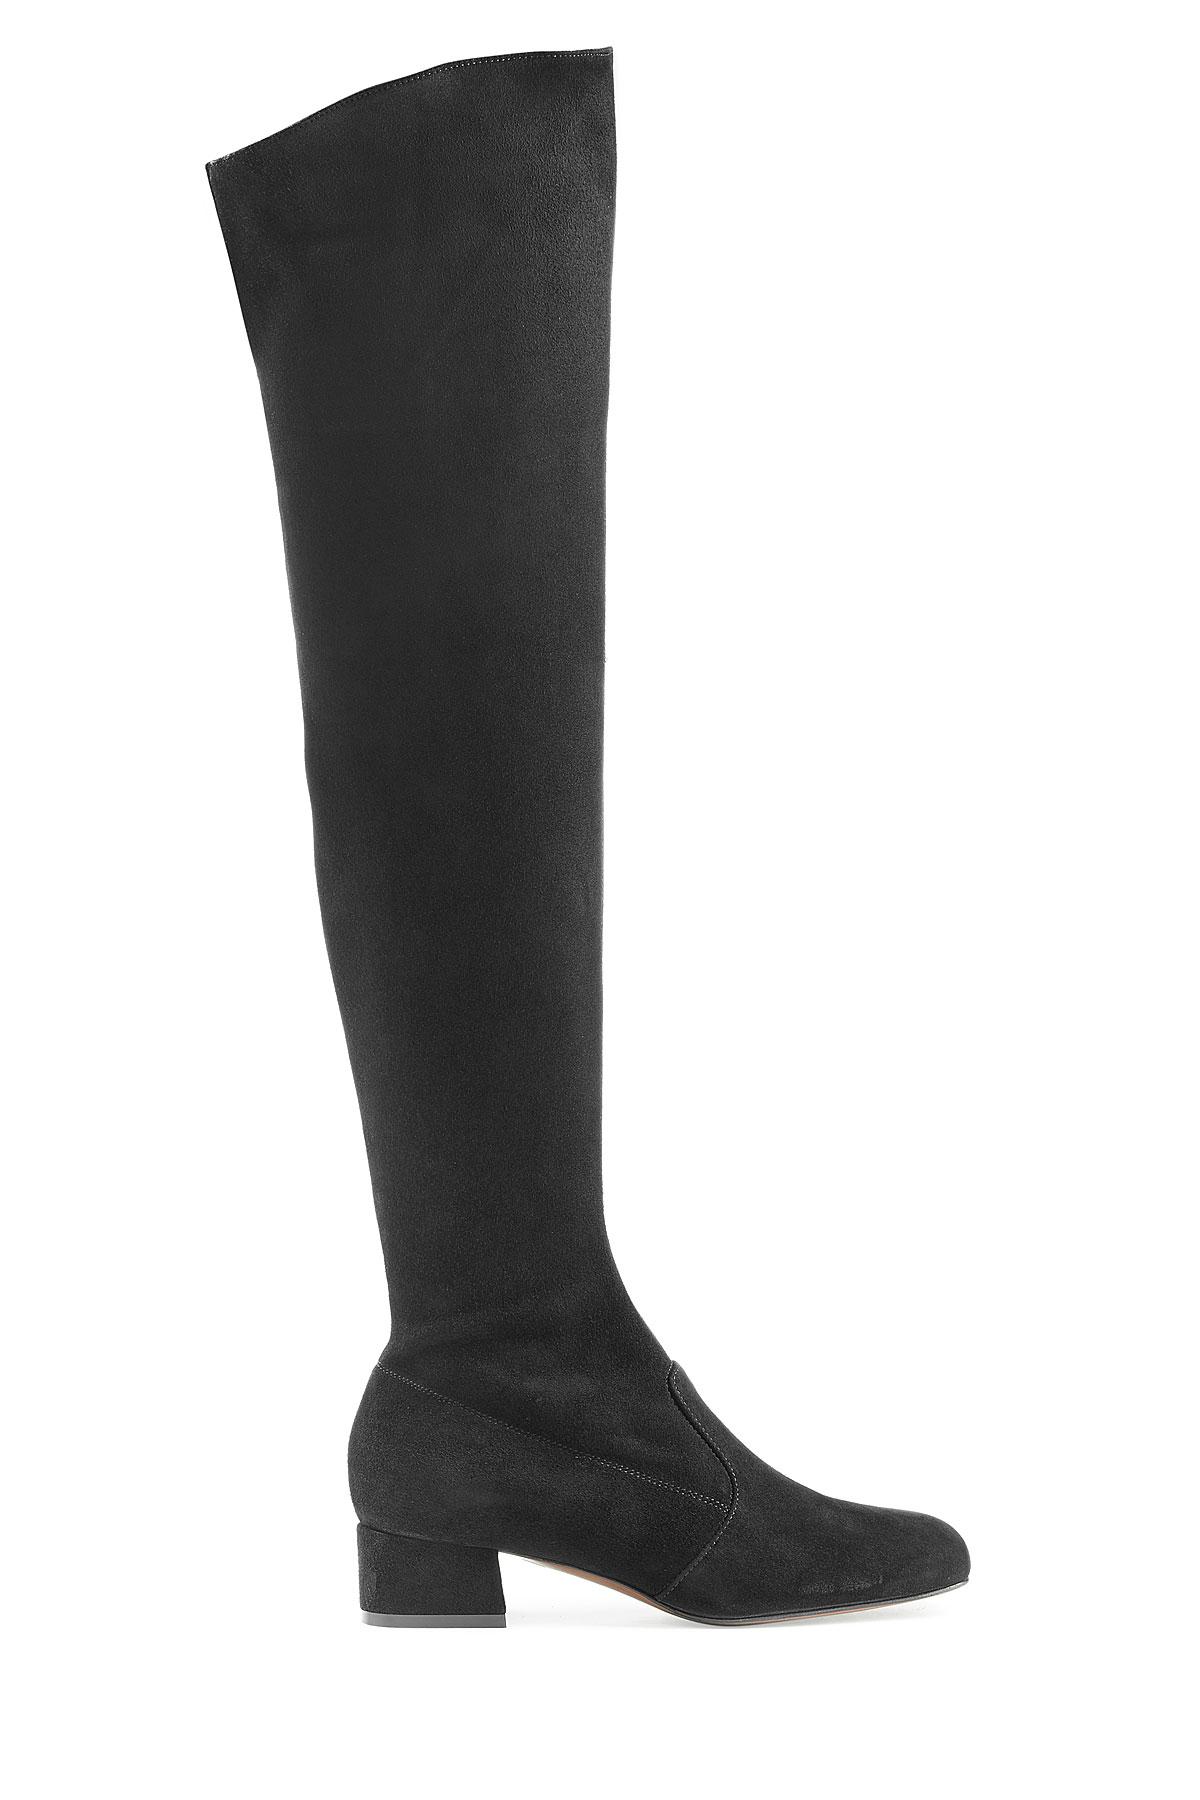 L\'autre chose Lautre Chose Over-the-knee Suede Boots - Black in ...